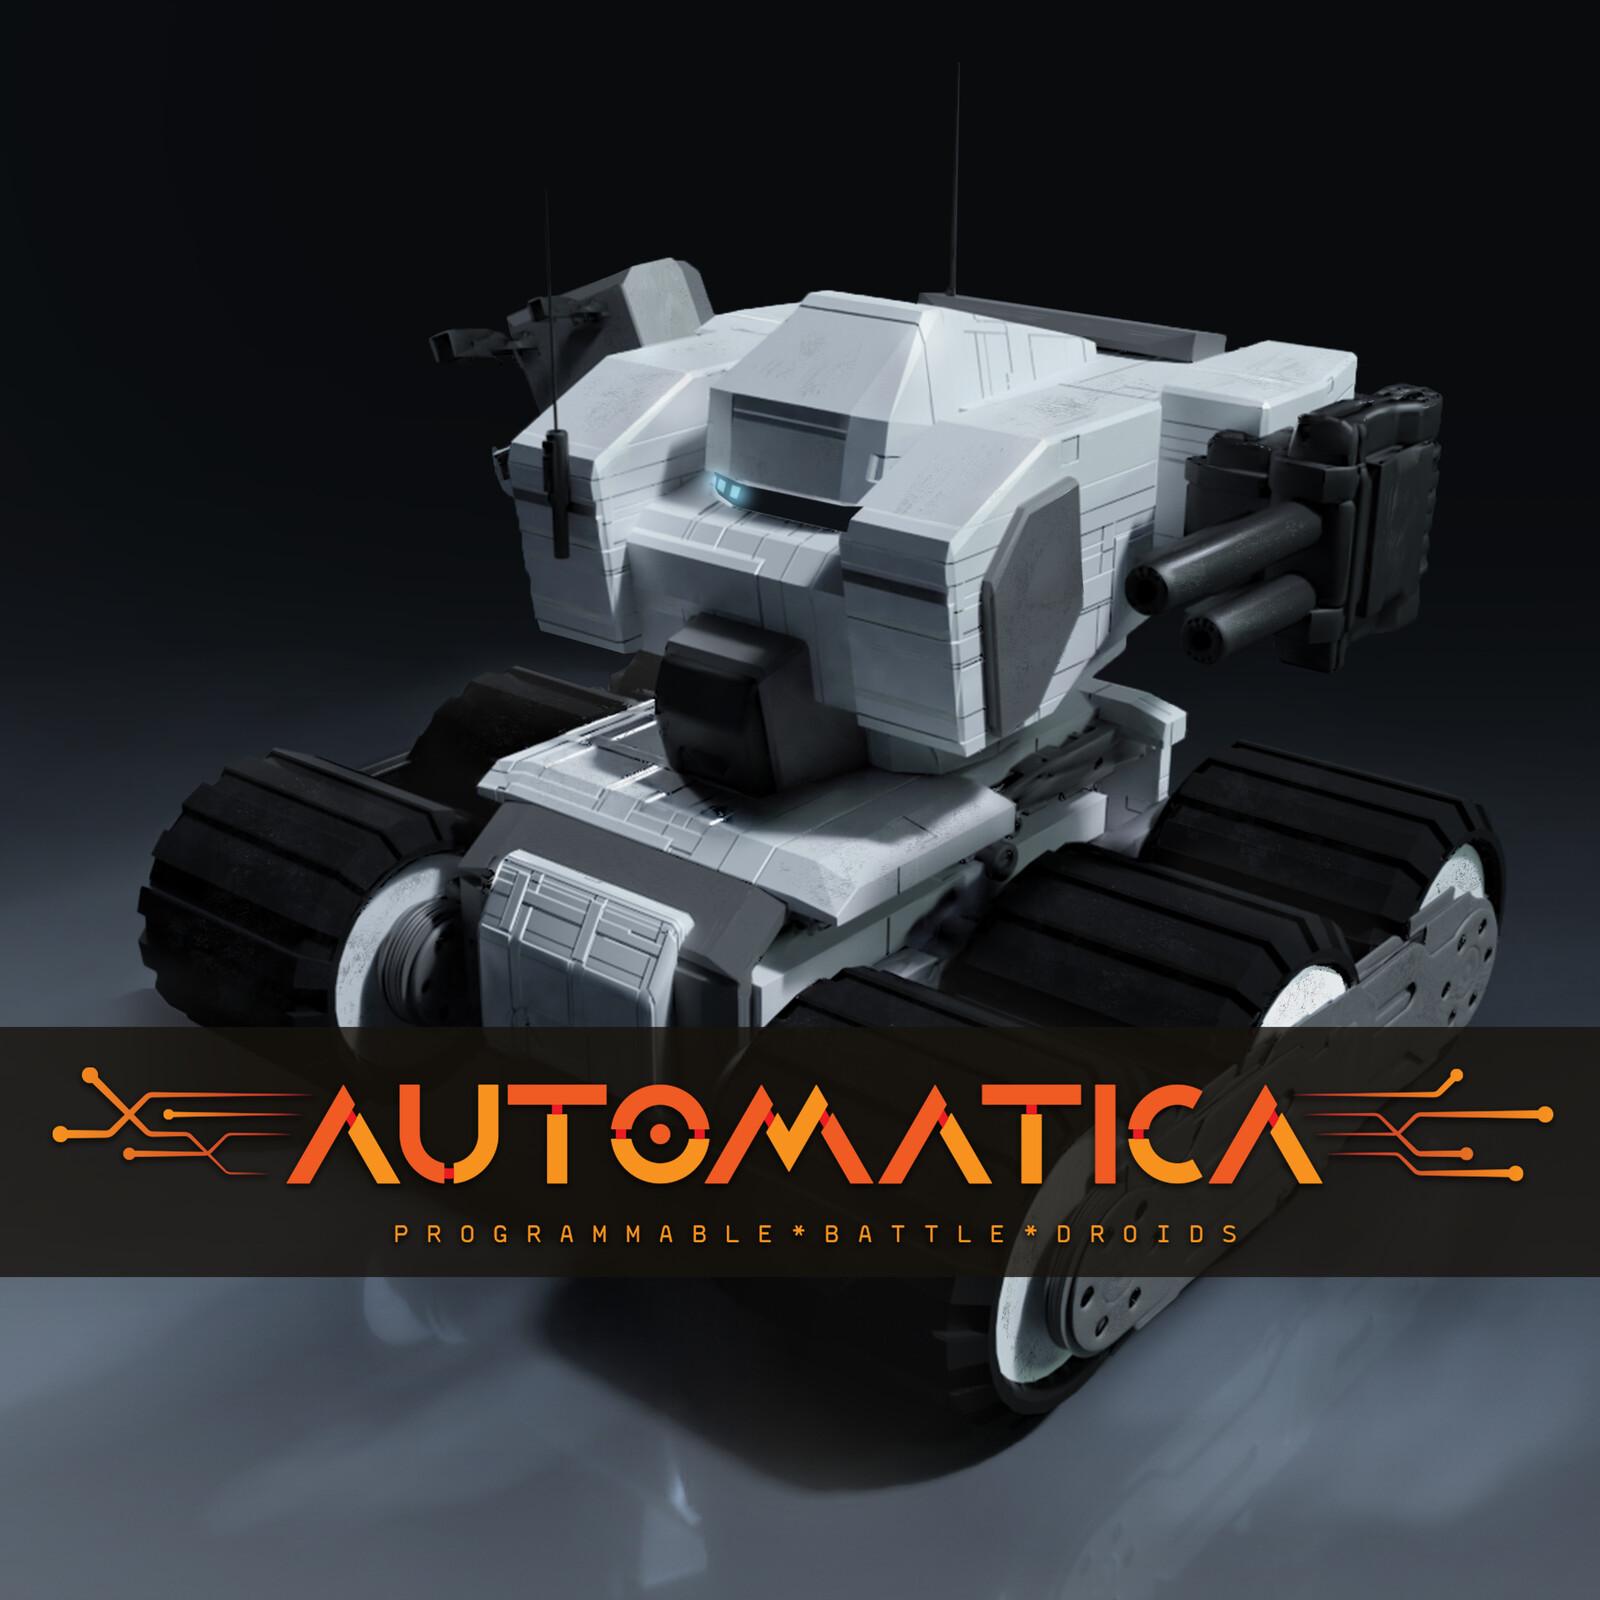 AUTOMATICA - ROBOT CONCEPT DESIGN